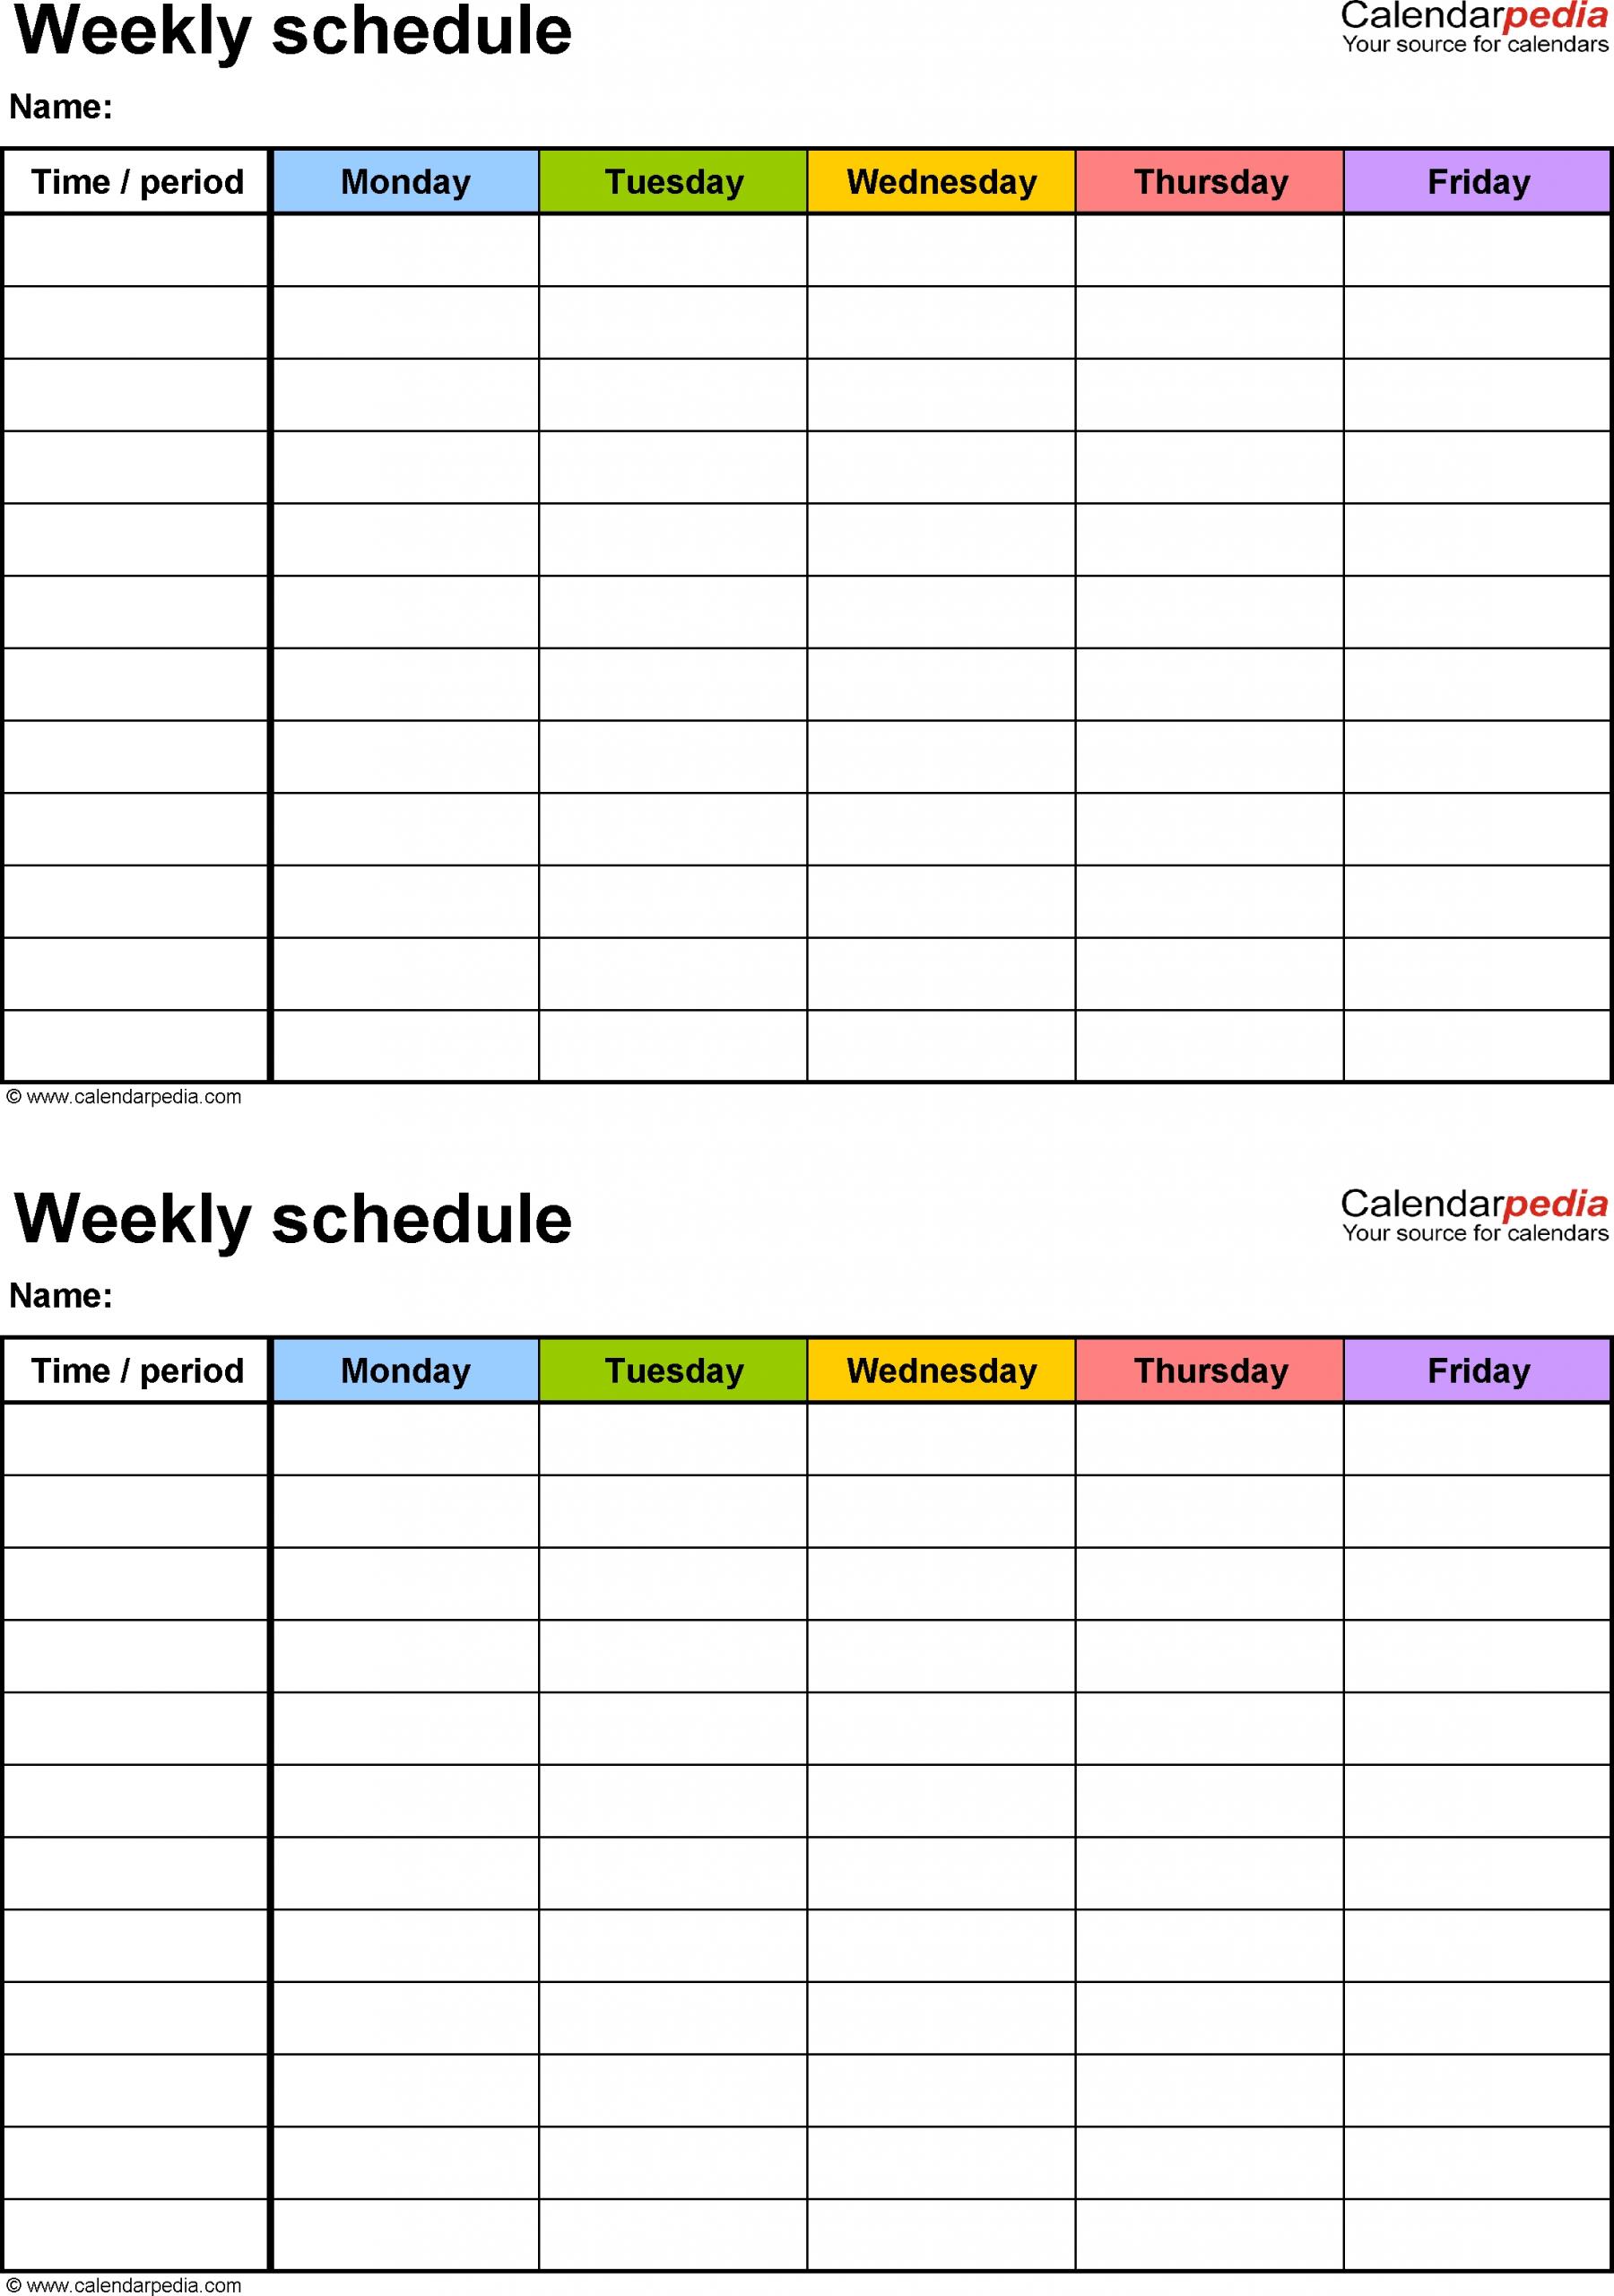 Monday Friday Blank Weekly Schedule   Calendar Template Free Printable Weekly Schedule Monday Fridays